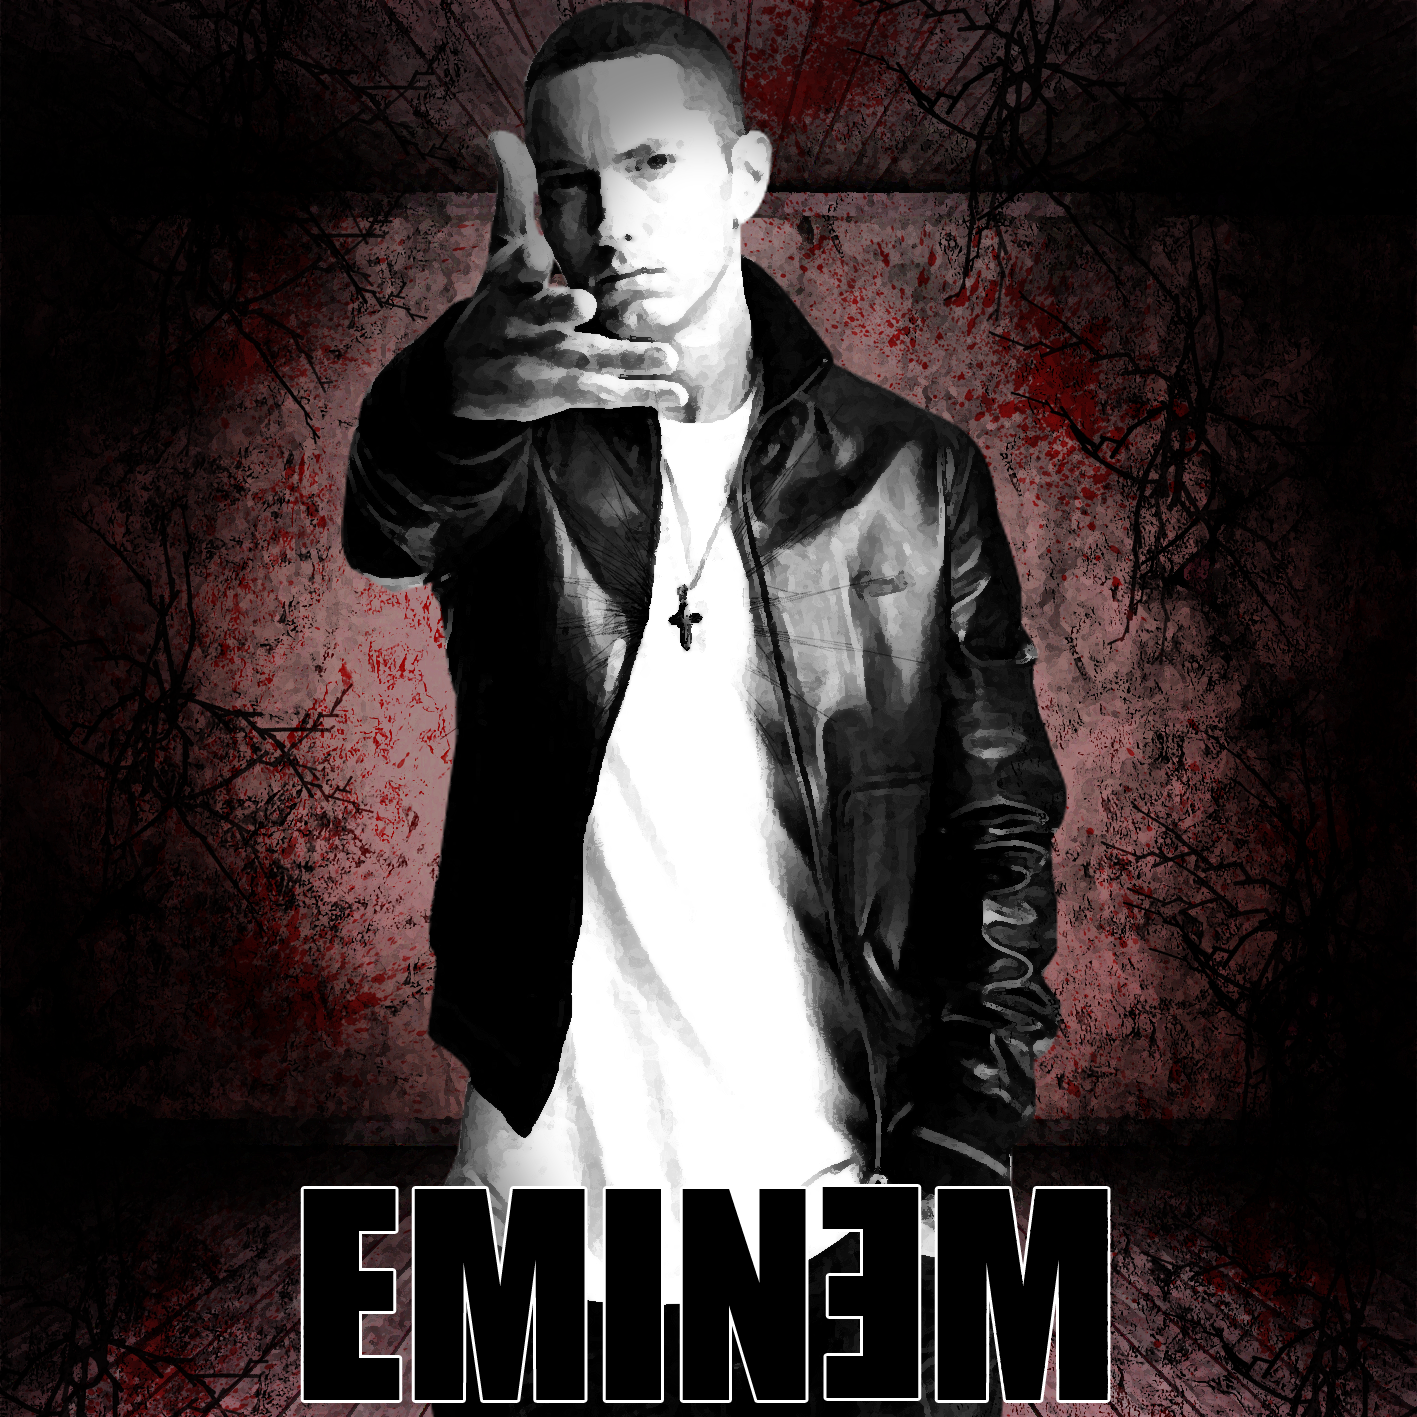 Eminem Album Art by TommyDLC1 on DeviantArt